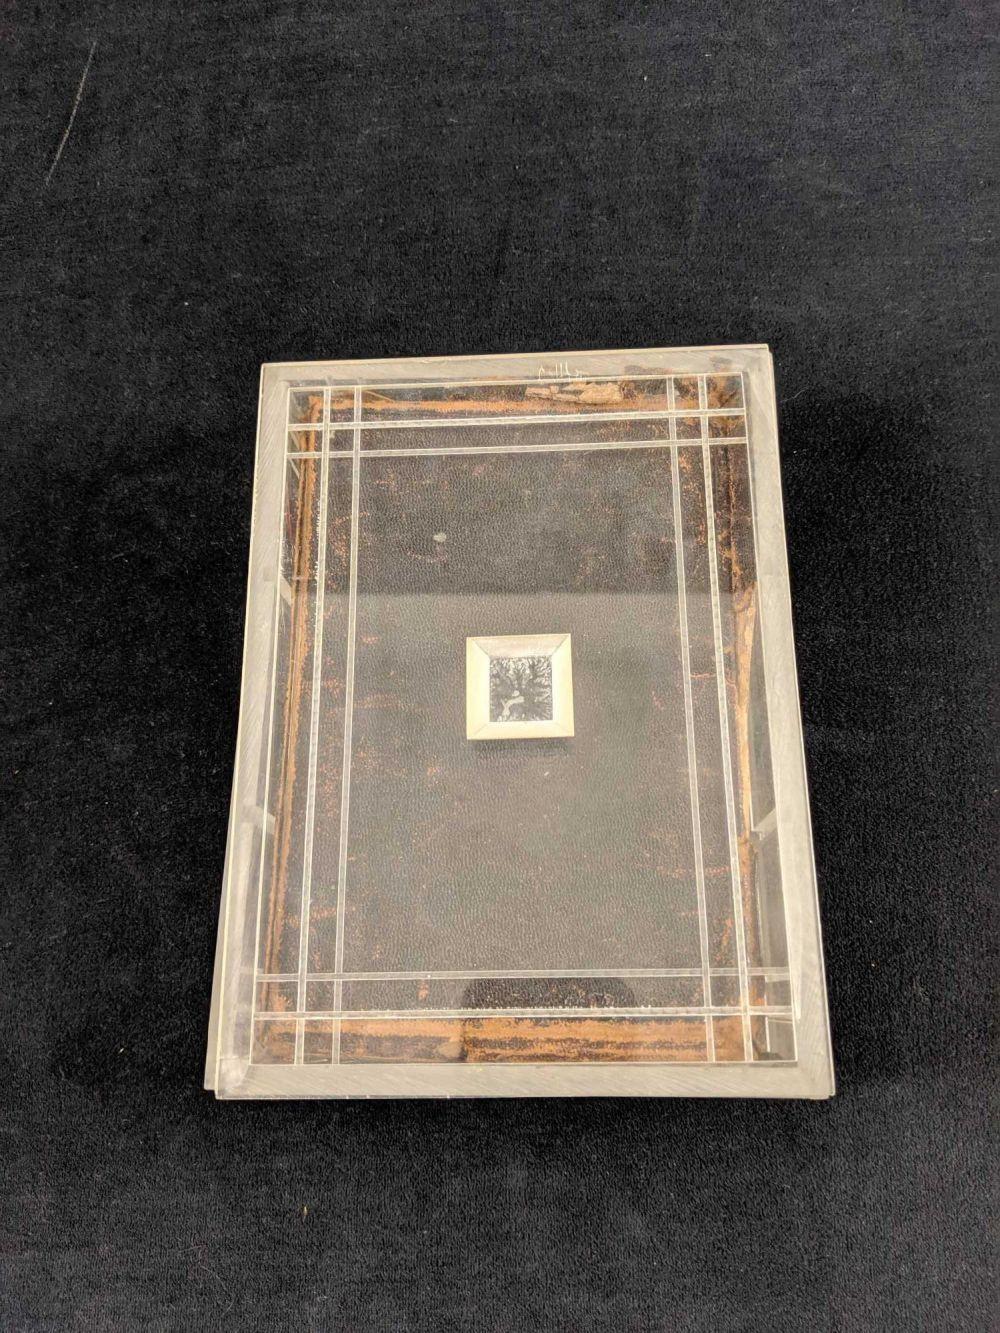 Lot 288: Vintage Antique Oxford University Bible Old & New Testament